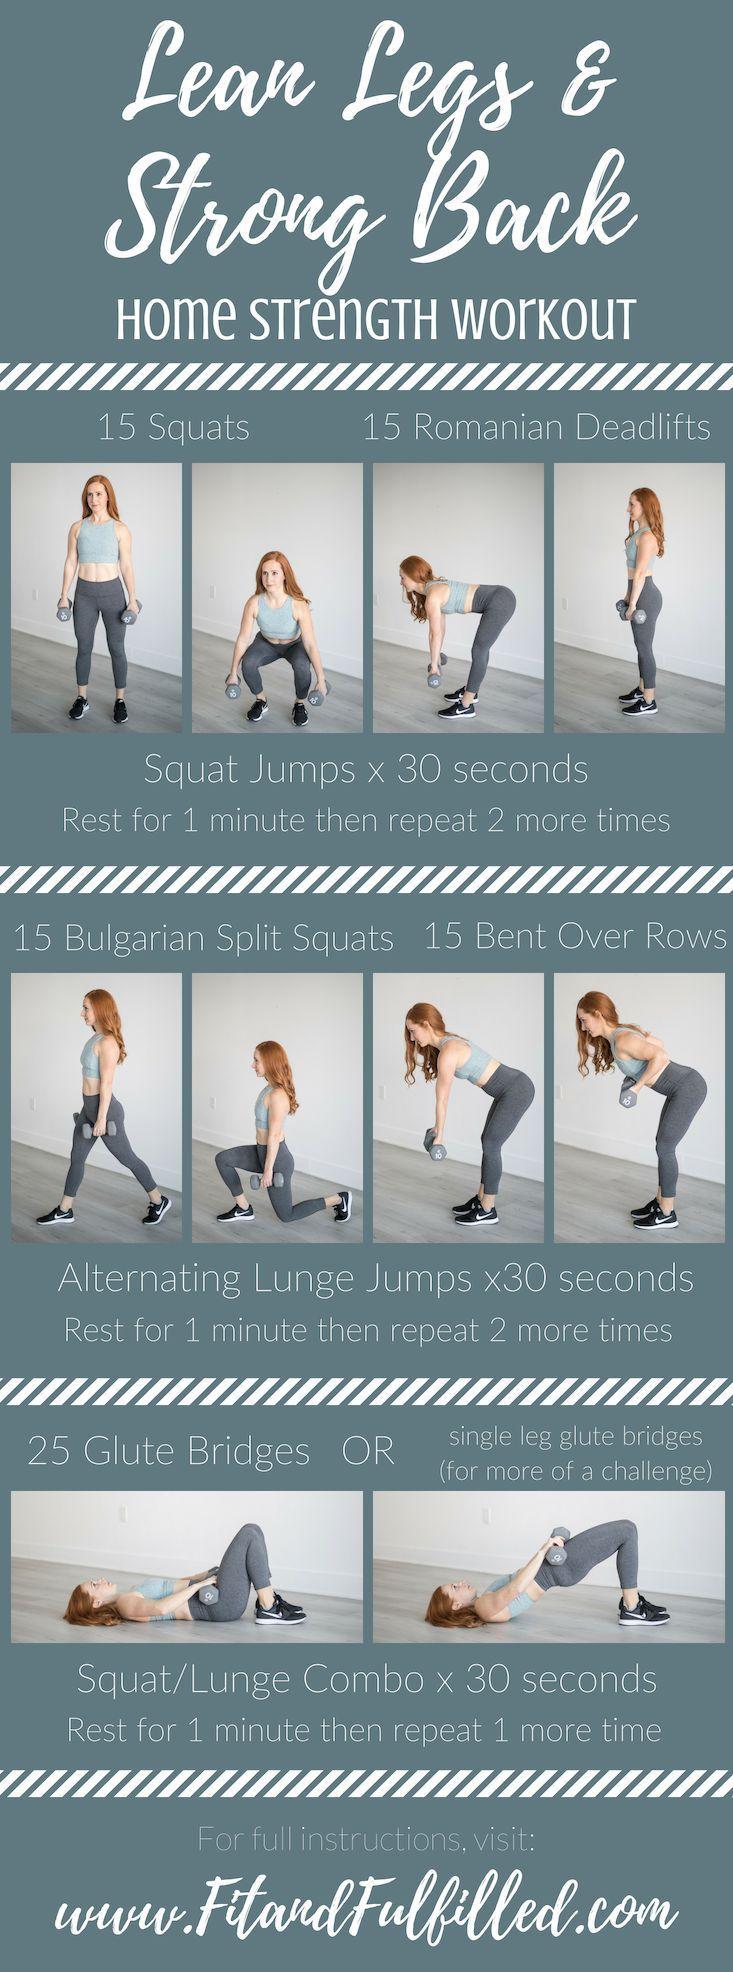 #strengthtraining #homeworkout #plyometric #dumbbell #calories #workouts #workout #weights #cardio #...